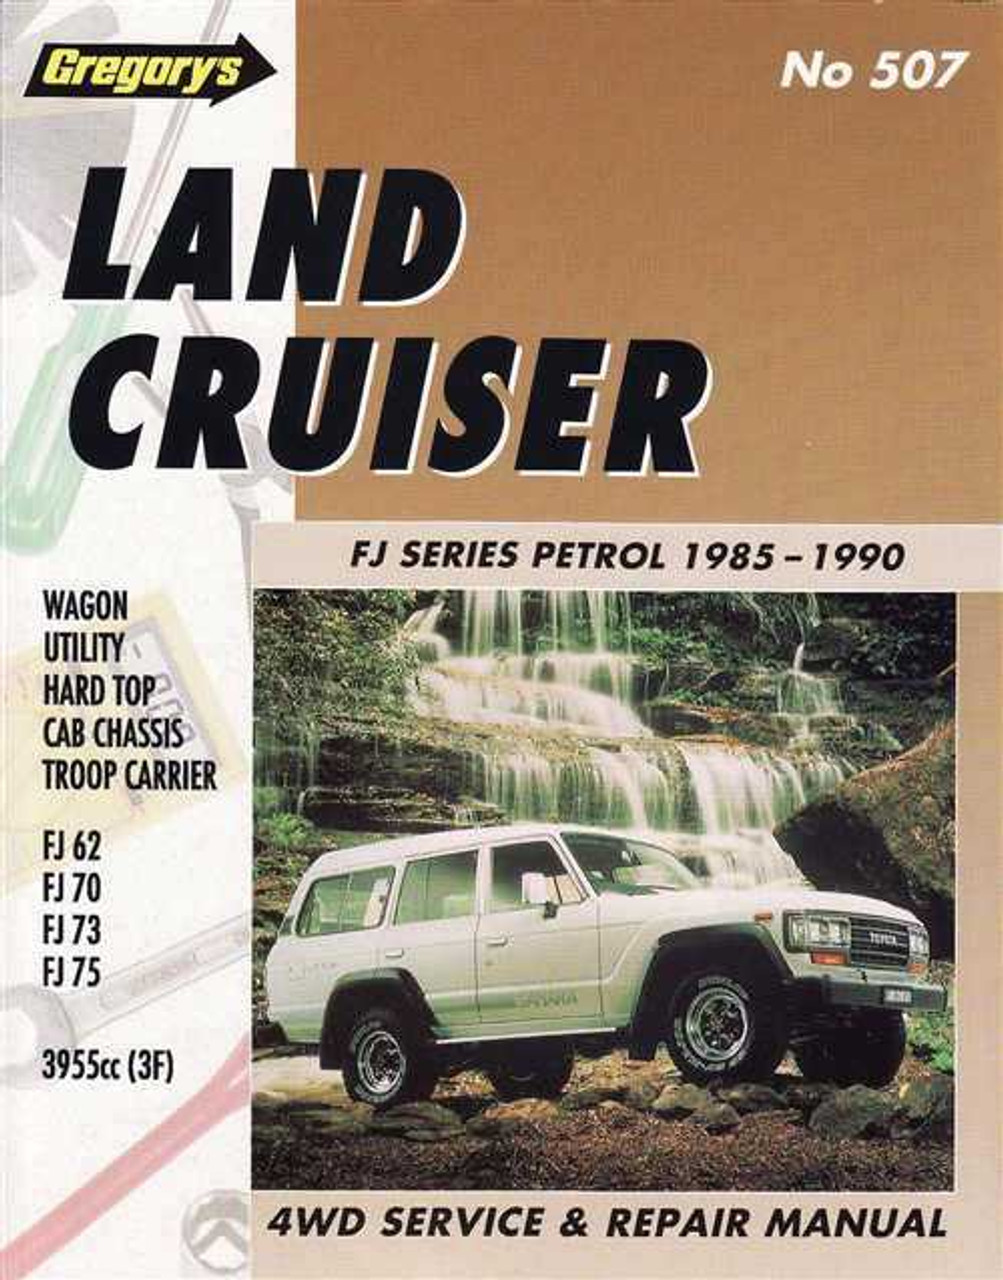 toyota land cruiser fj series 1985 1990 workshop manual rh automotobookshop com au 1990 FJ62 Wiper 1990 FJ62 Wiper